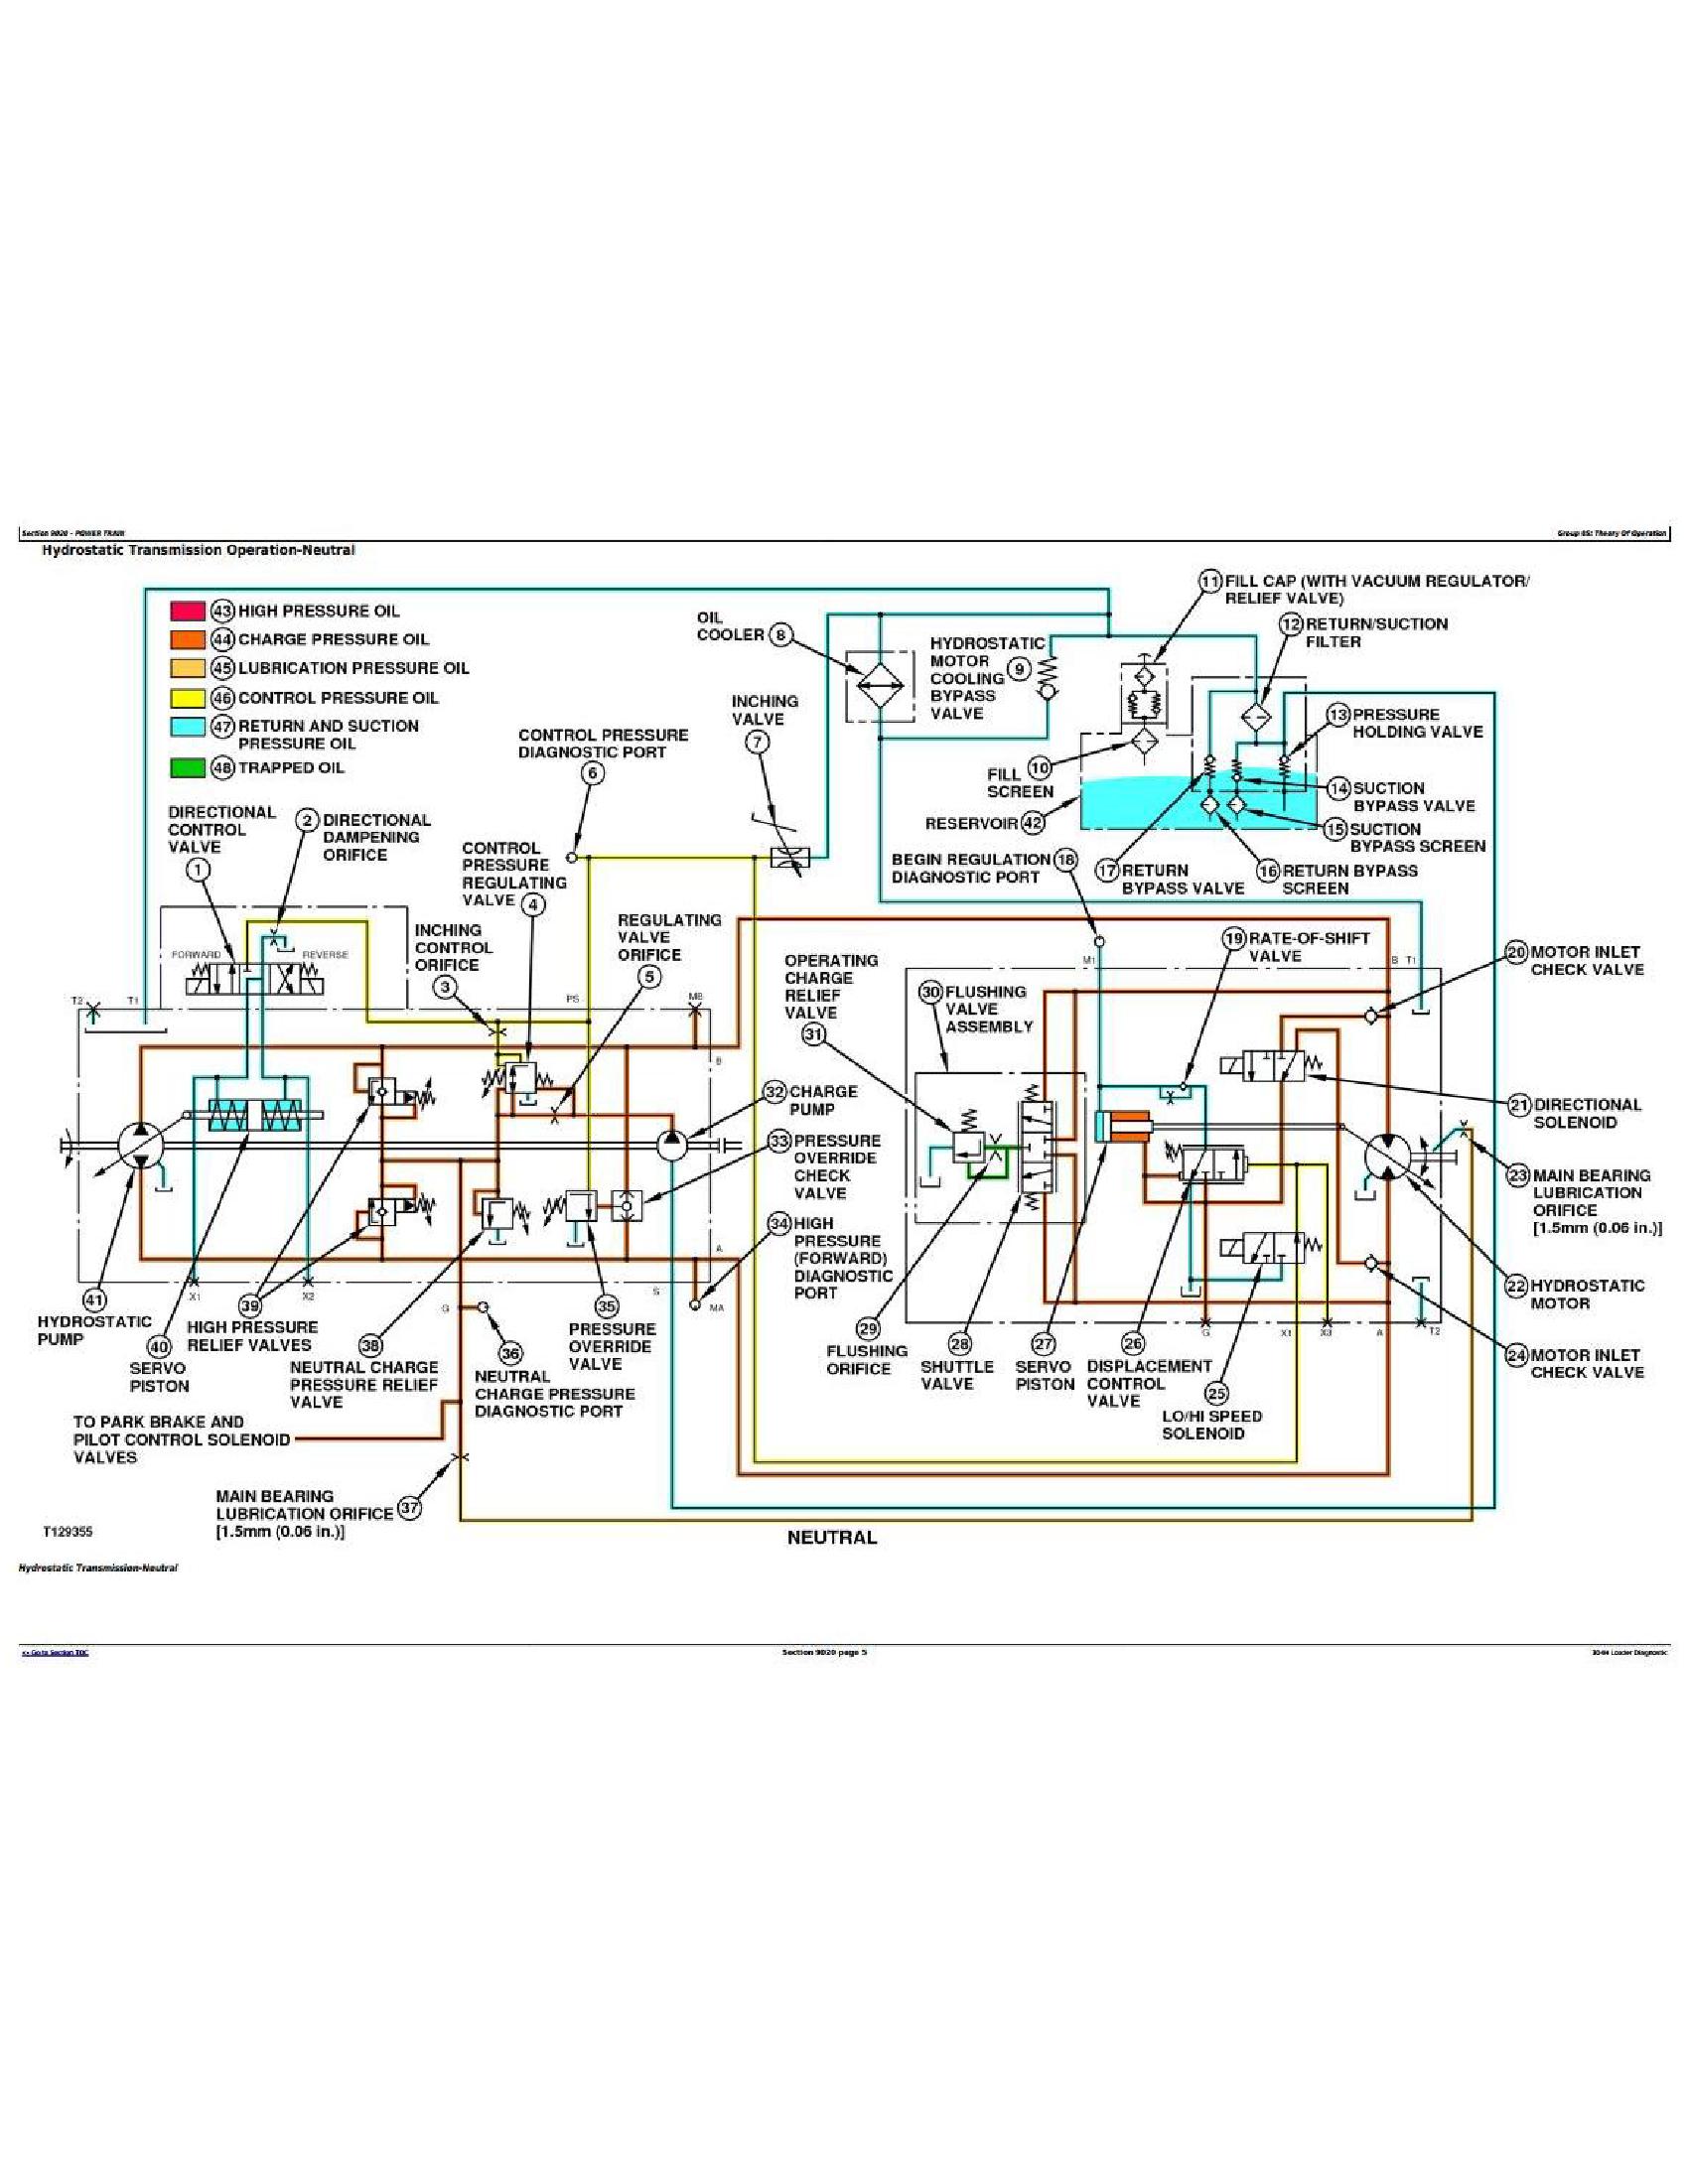 John Deere 1FF250GXF608713- manual pdf